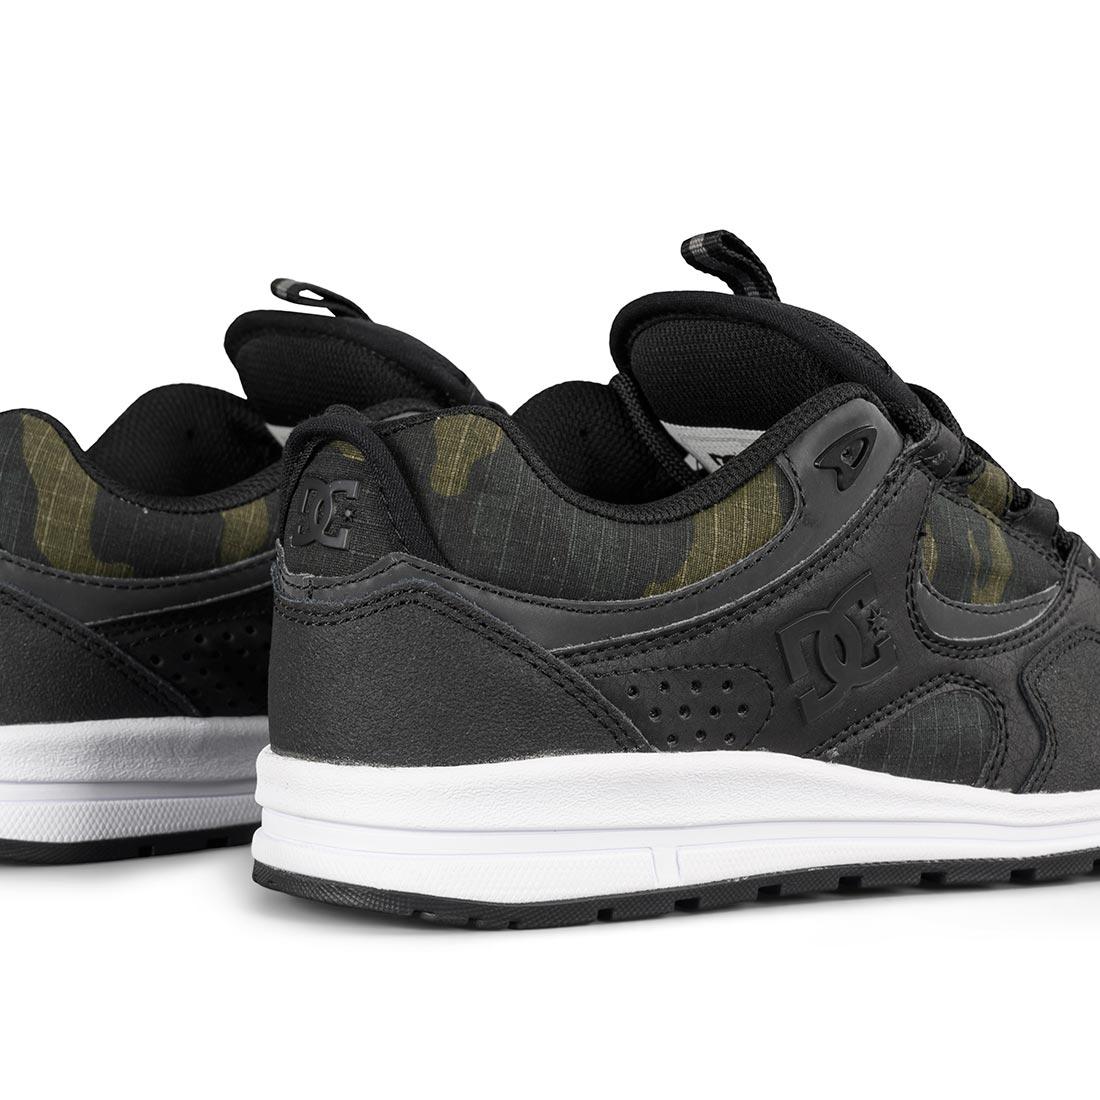 DC Shoes Kalis Lite SE - Black Camo